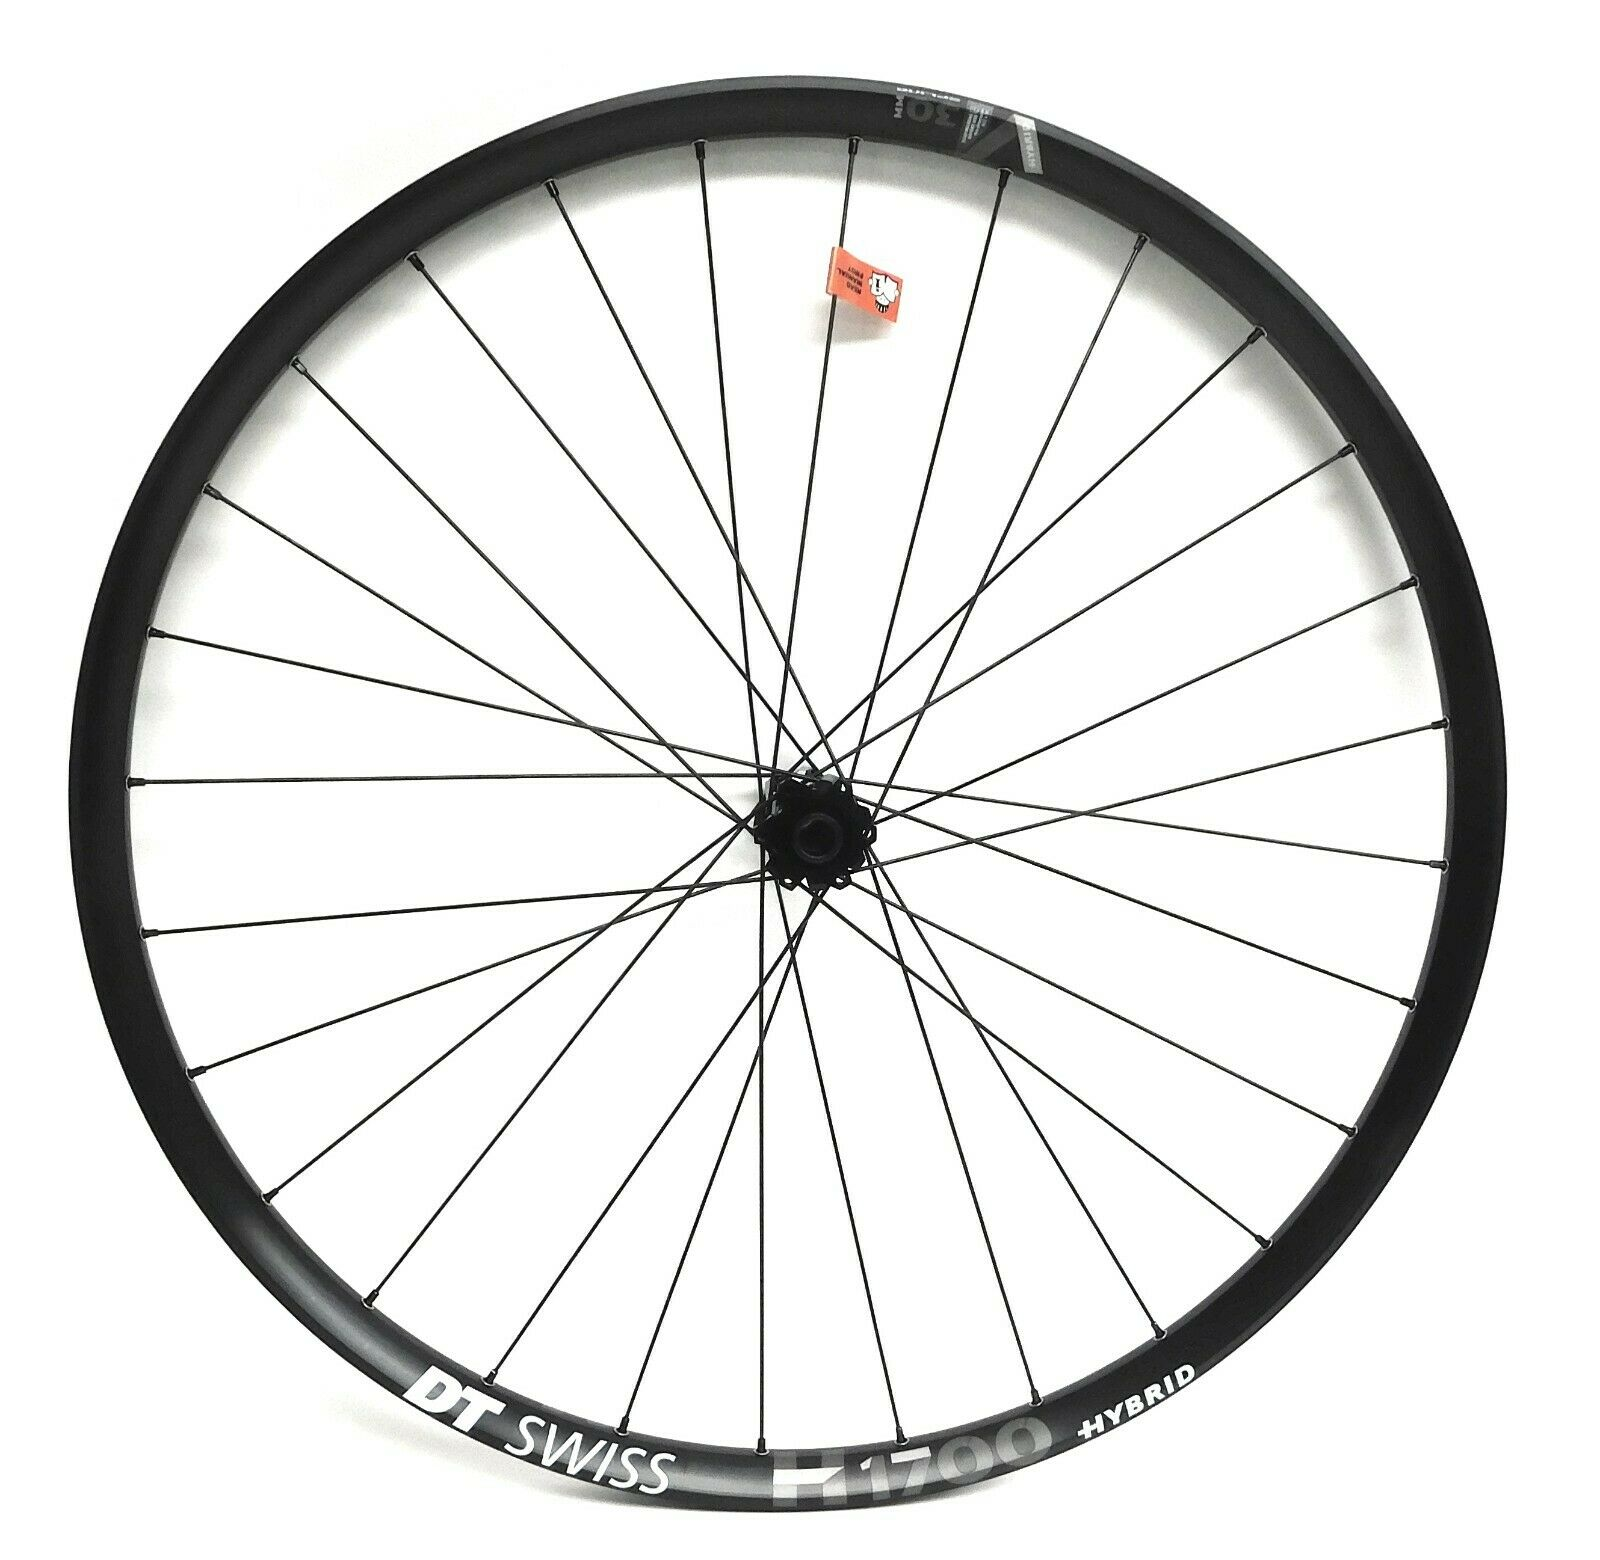 "NEW DT Swiss E1900 Spline 27.5/"" Front Wheel 15mm Thru Axle Center Lock Disc"